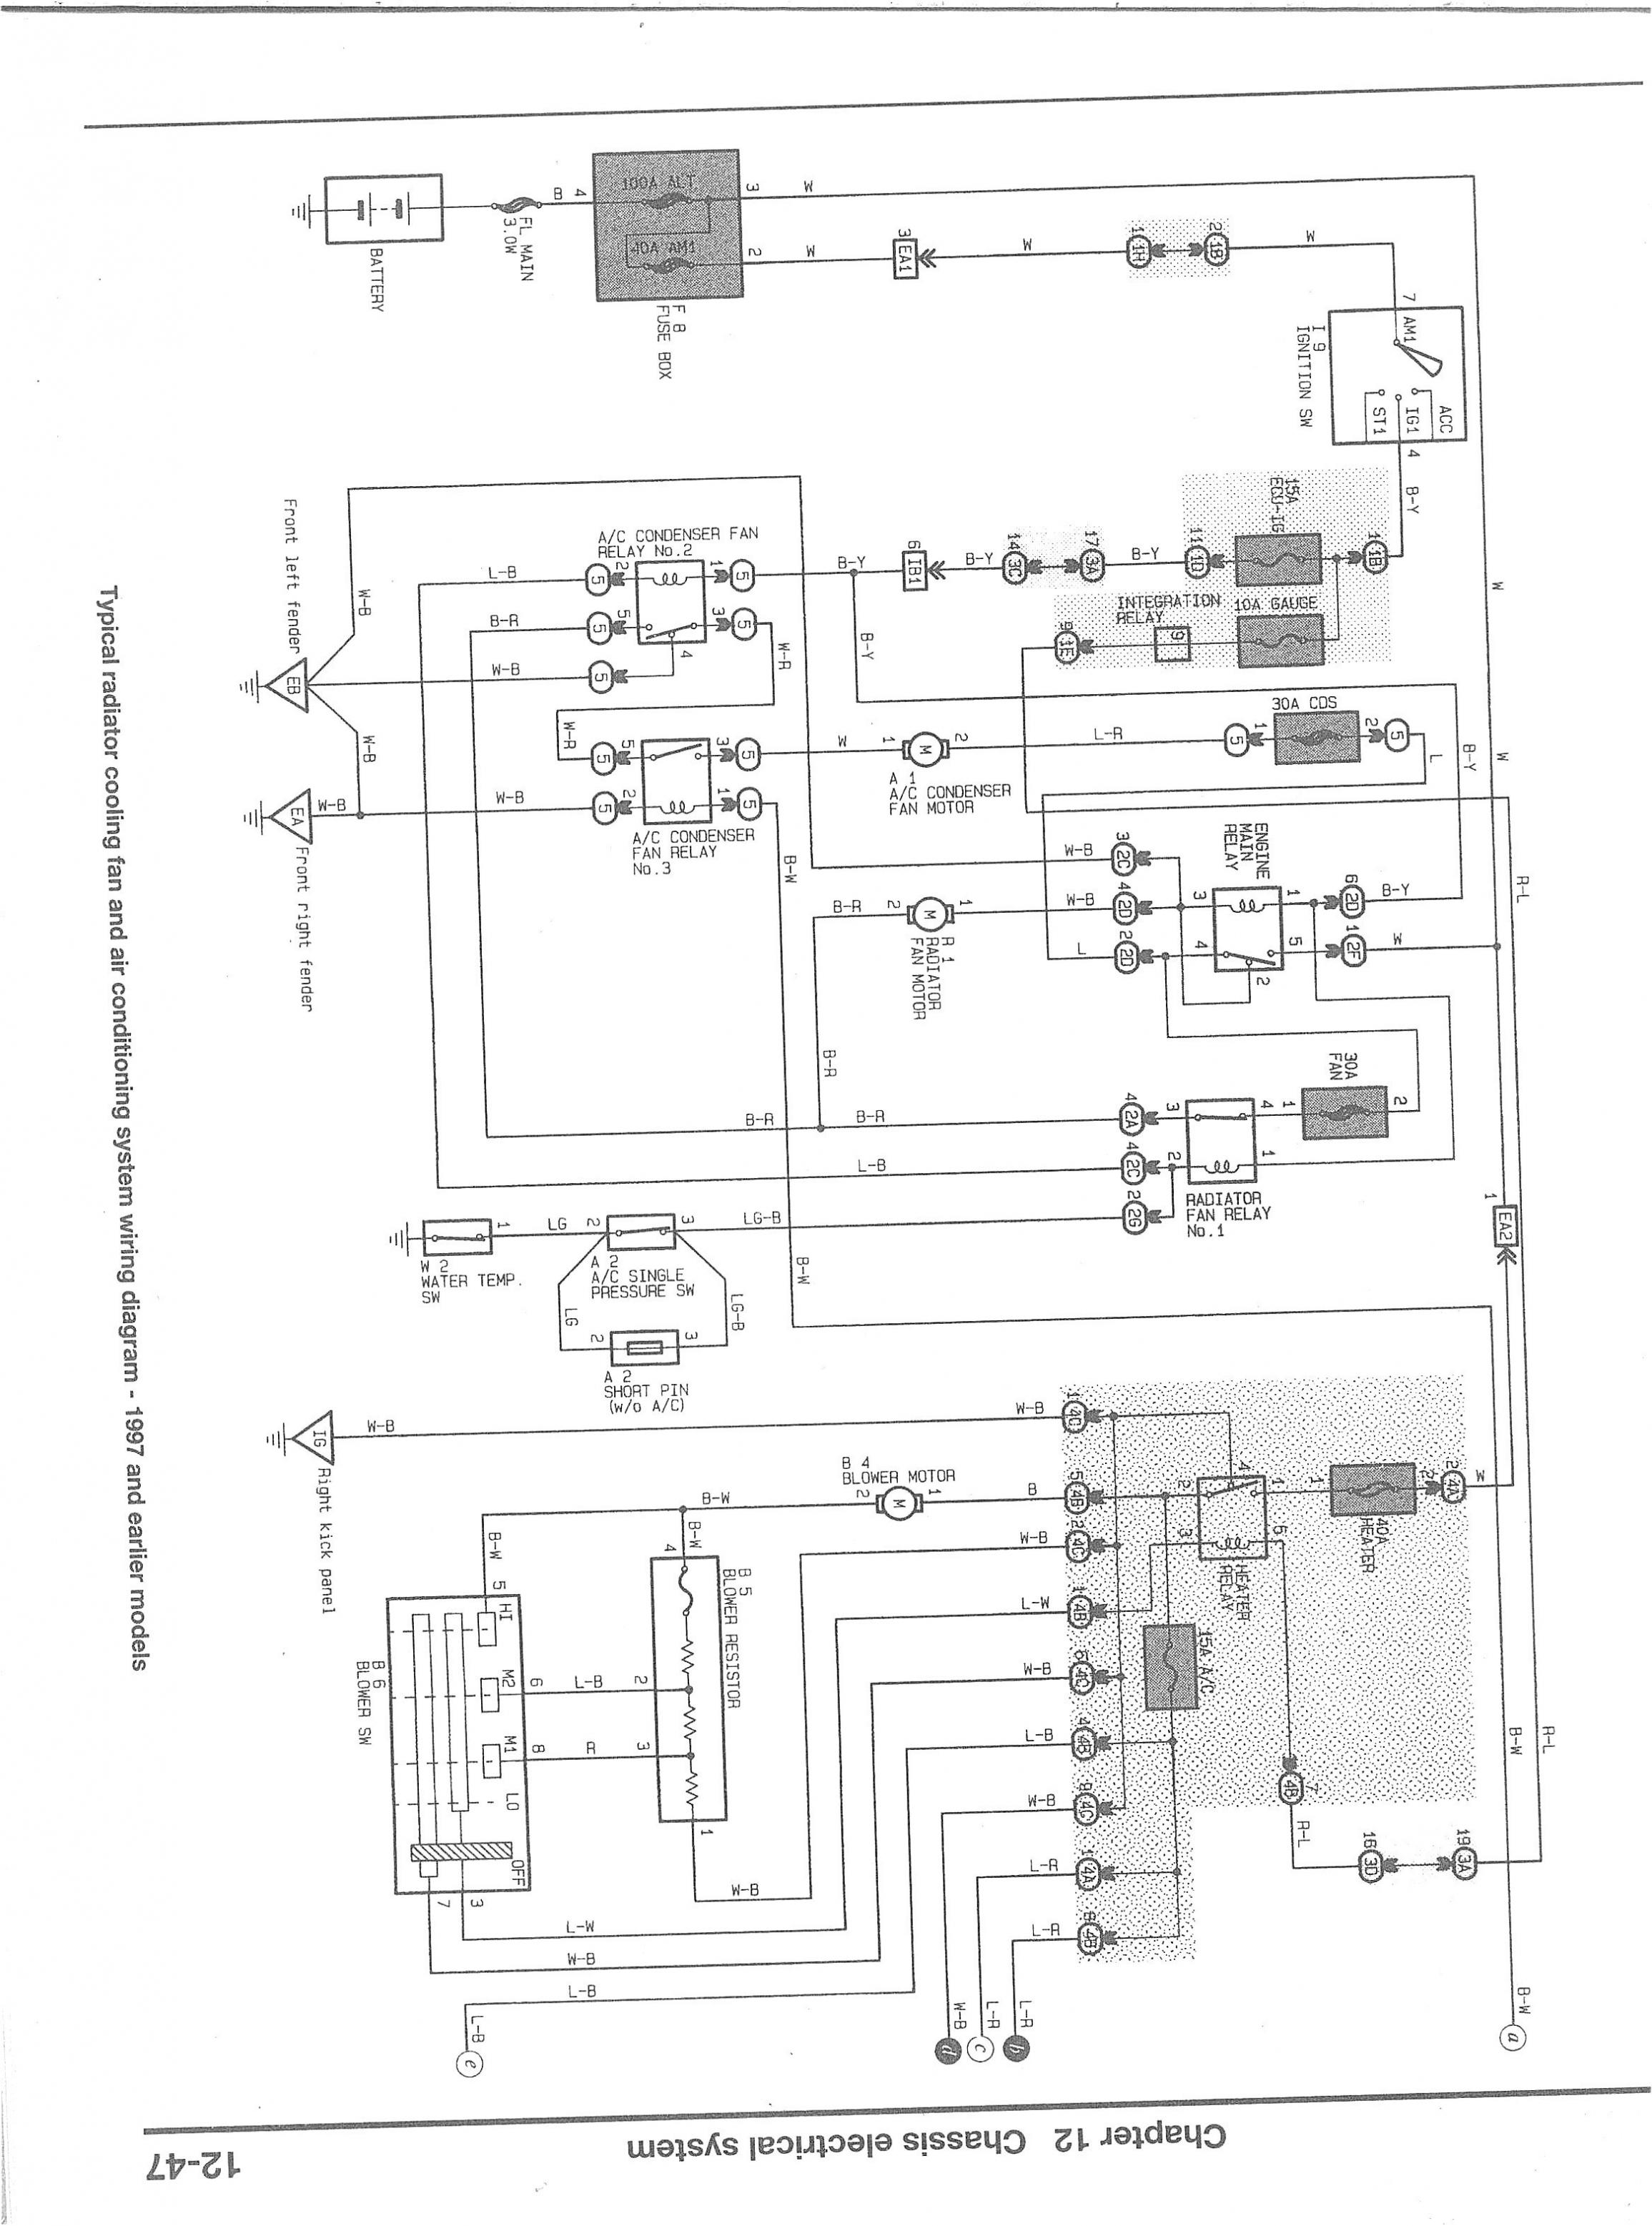 Goodman Aruf Air Handler Wiring Diagrams Furnace Model | Wiring Library - Goodman Aruf Air Handler Wiring Diagram